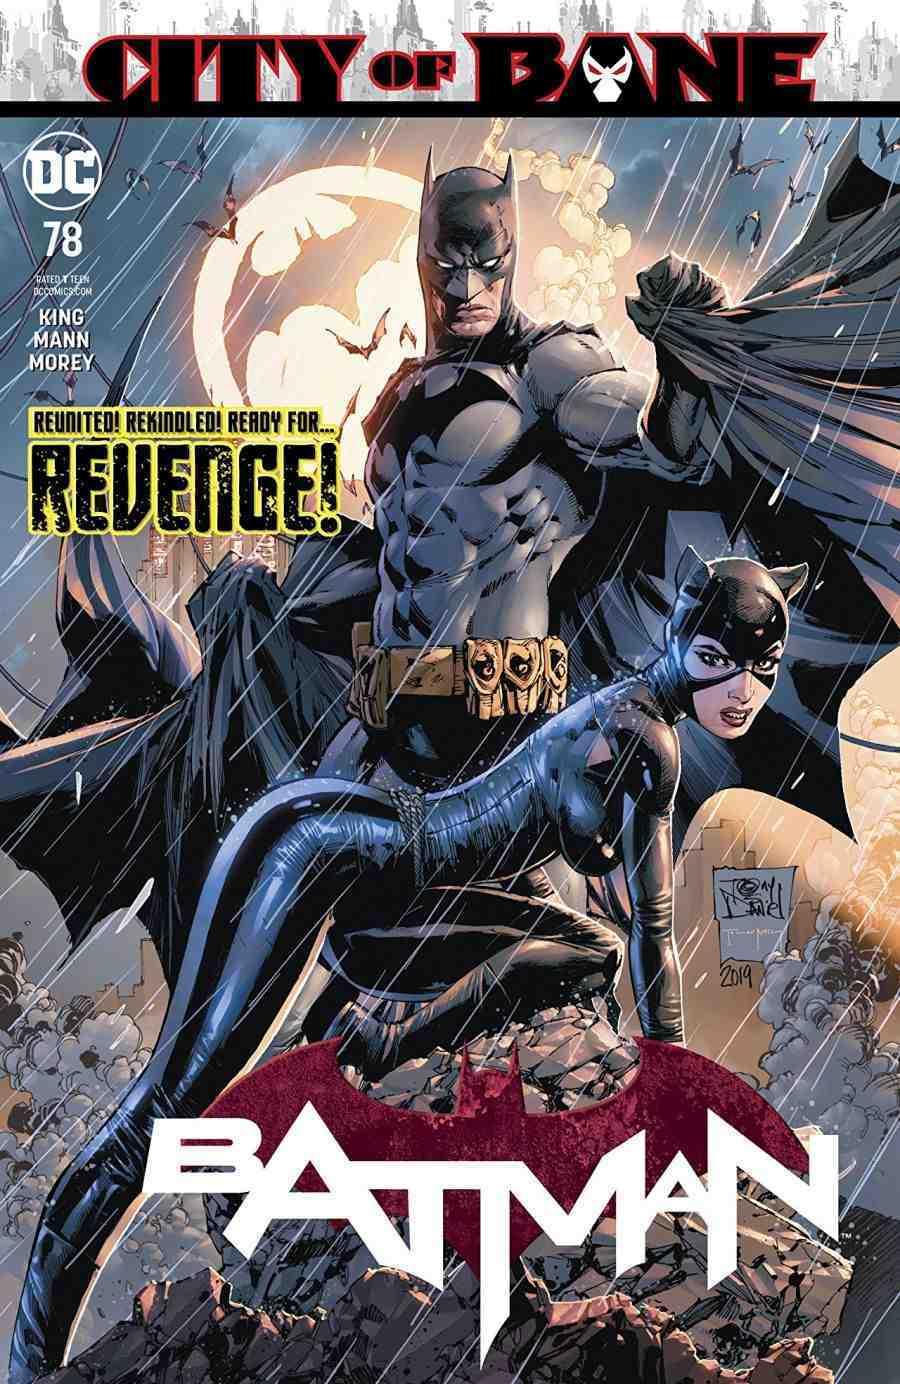 Batman #78